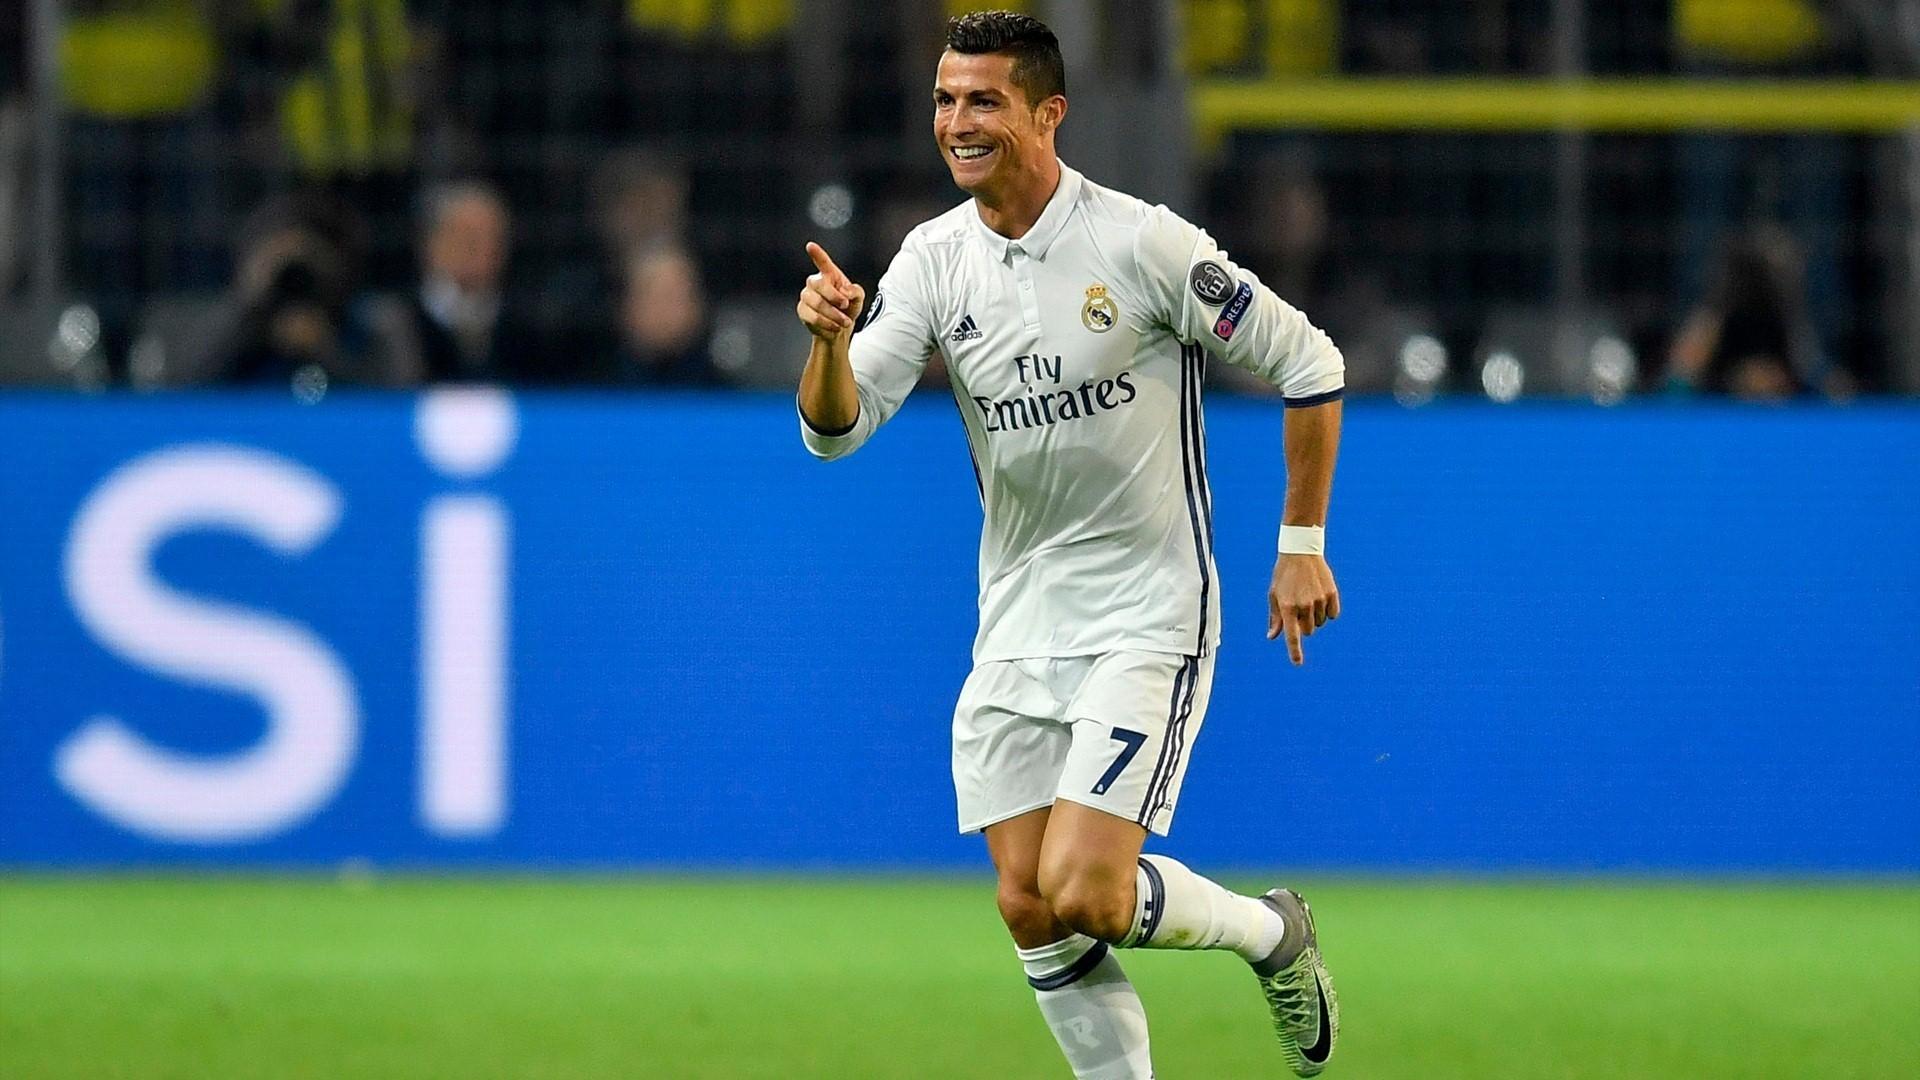 Football Cristiano Ronaldo Hd Wallpapers: CR7 HD Wallpaper 2018 (72+ Images